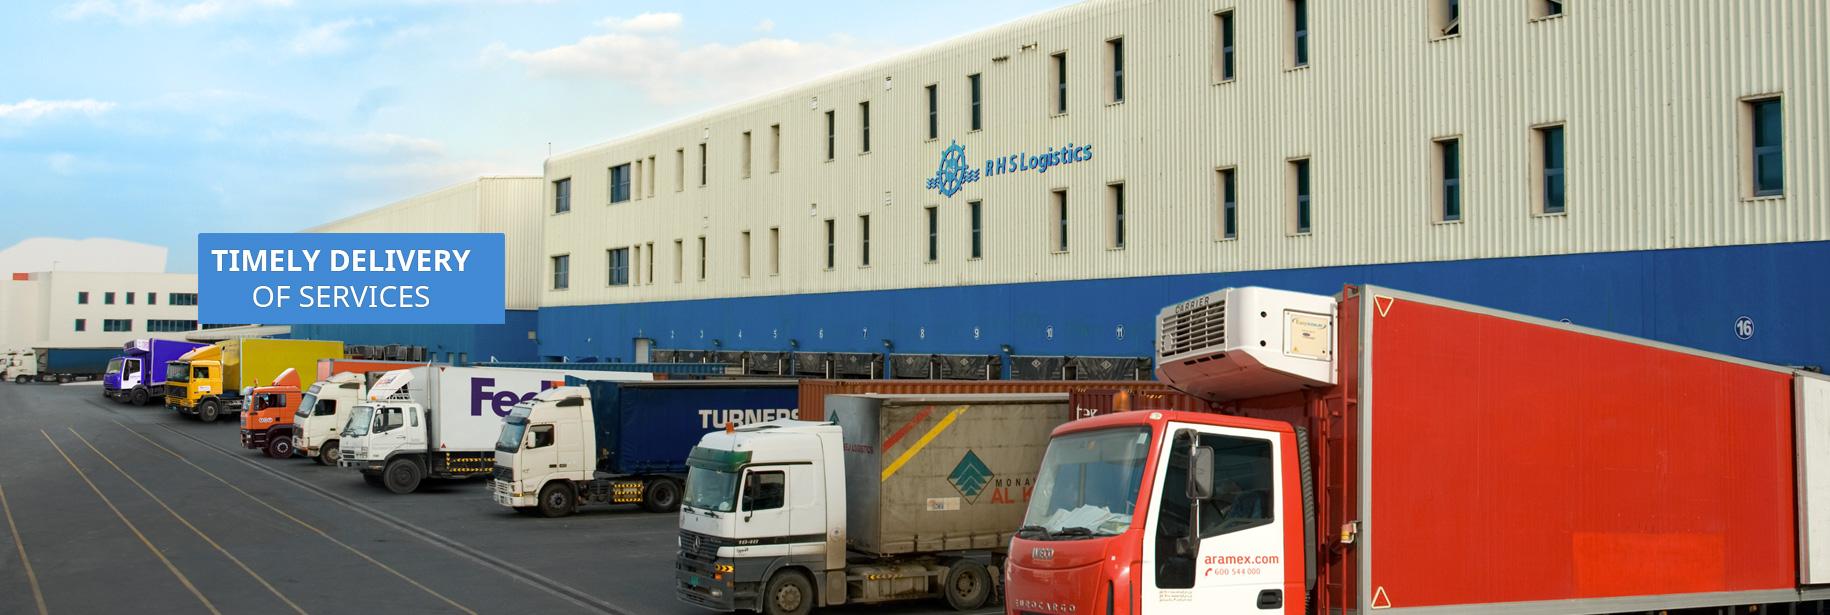 Rhs logistics logo